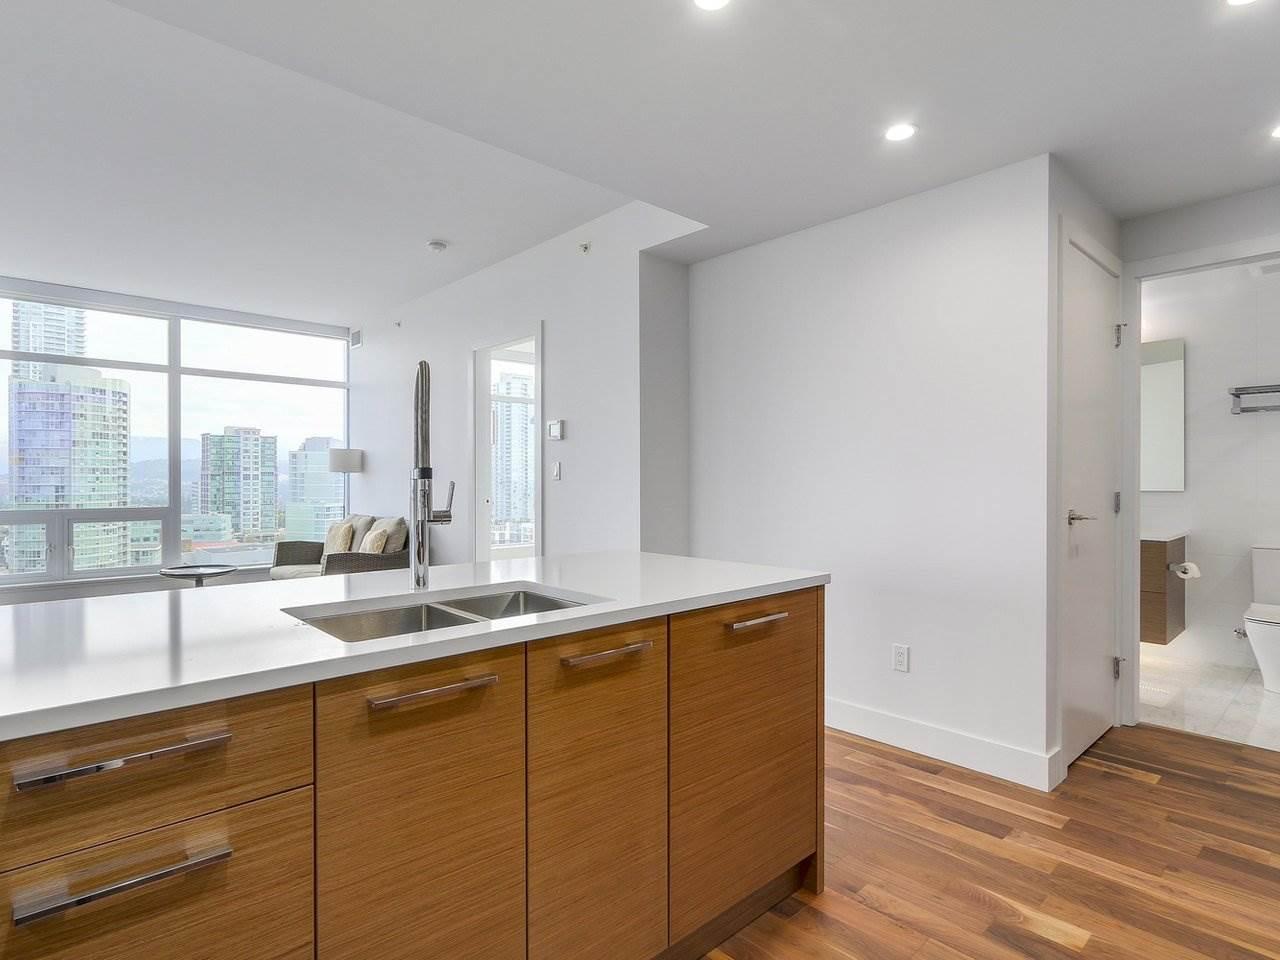 Condo Apartment at 1202 4360 BERESFORD STREET, Unit 1202, Burnaby South, British Columbia. Image 4